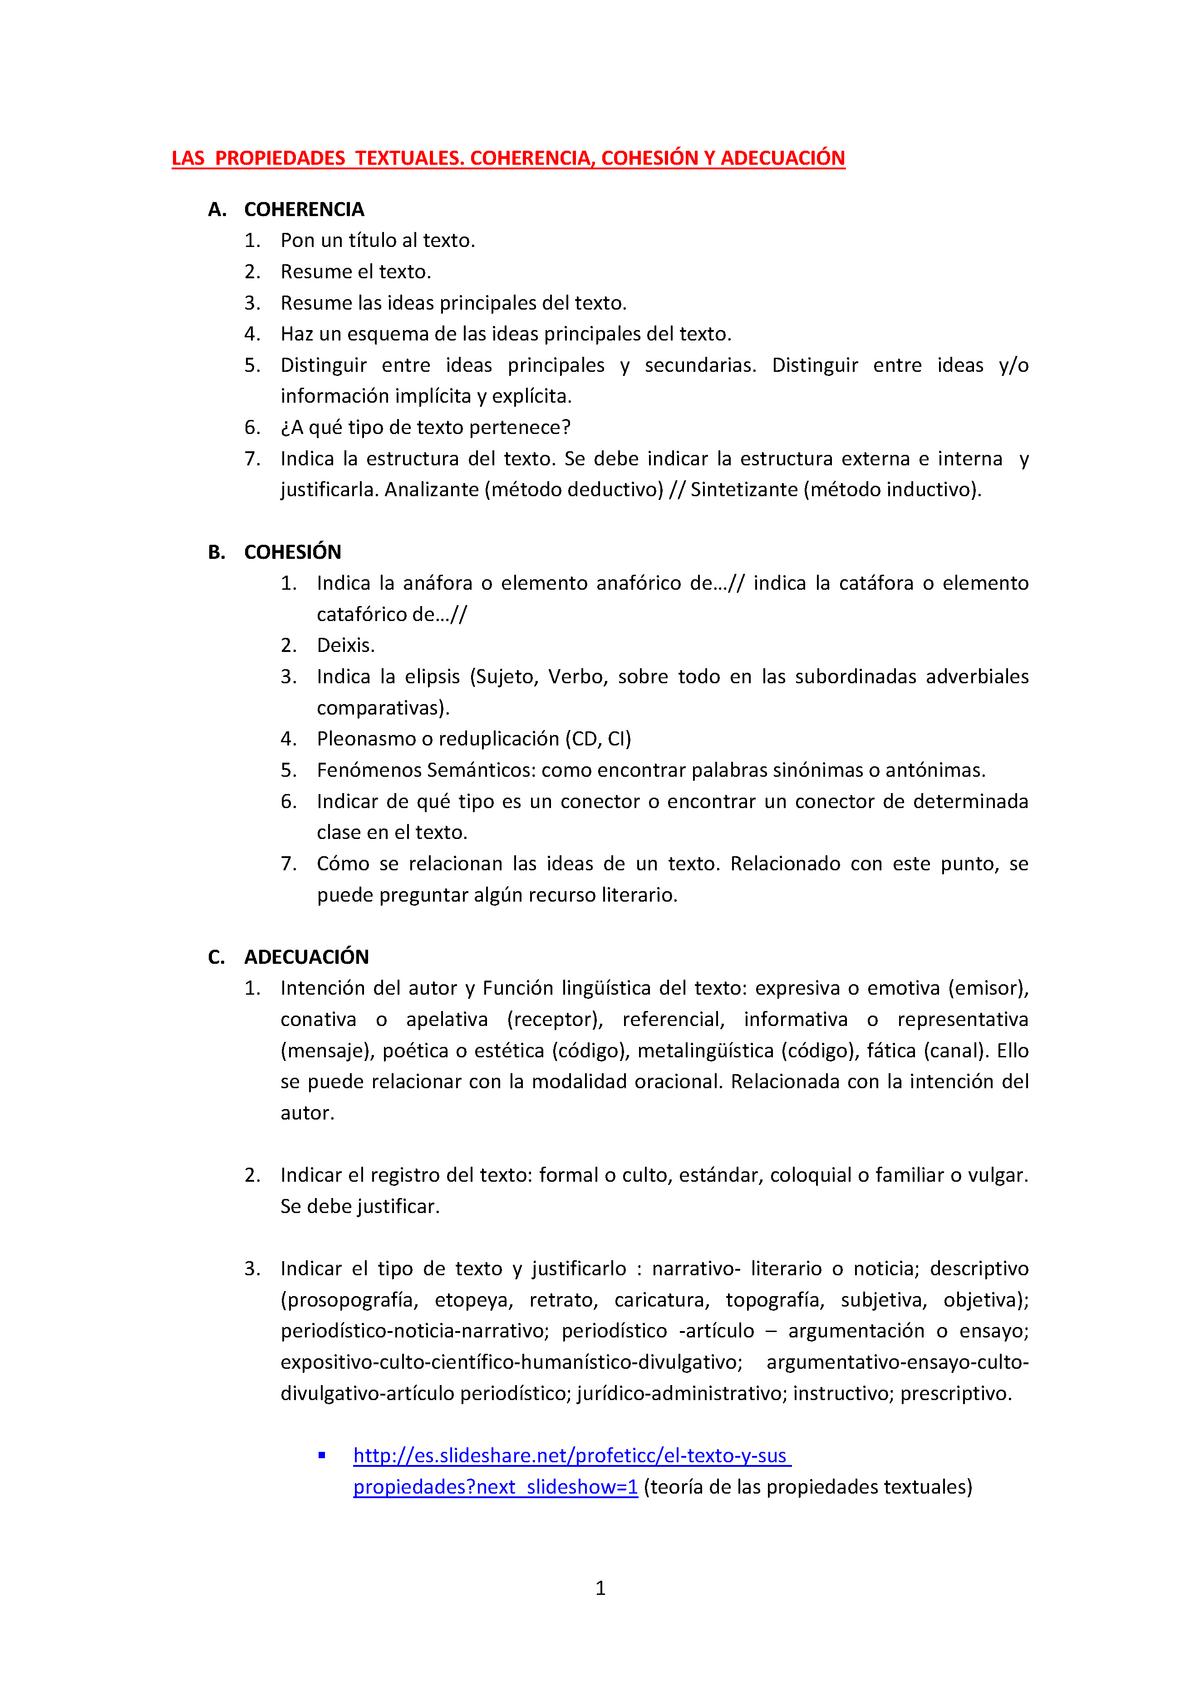 Propiedadestextuales Lengua Castellana Uab Studocu